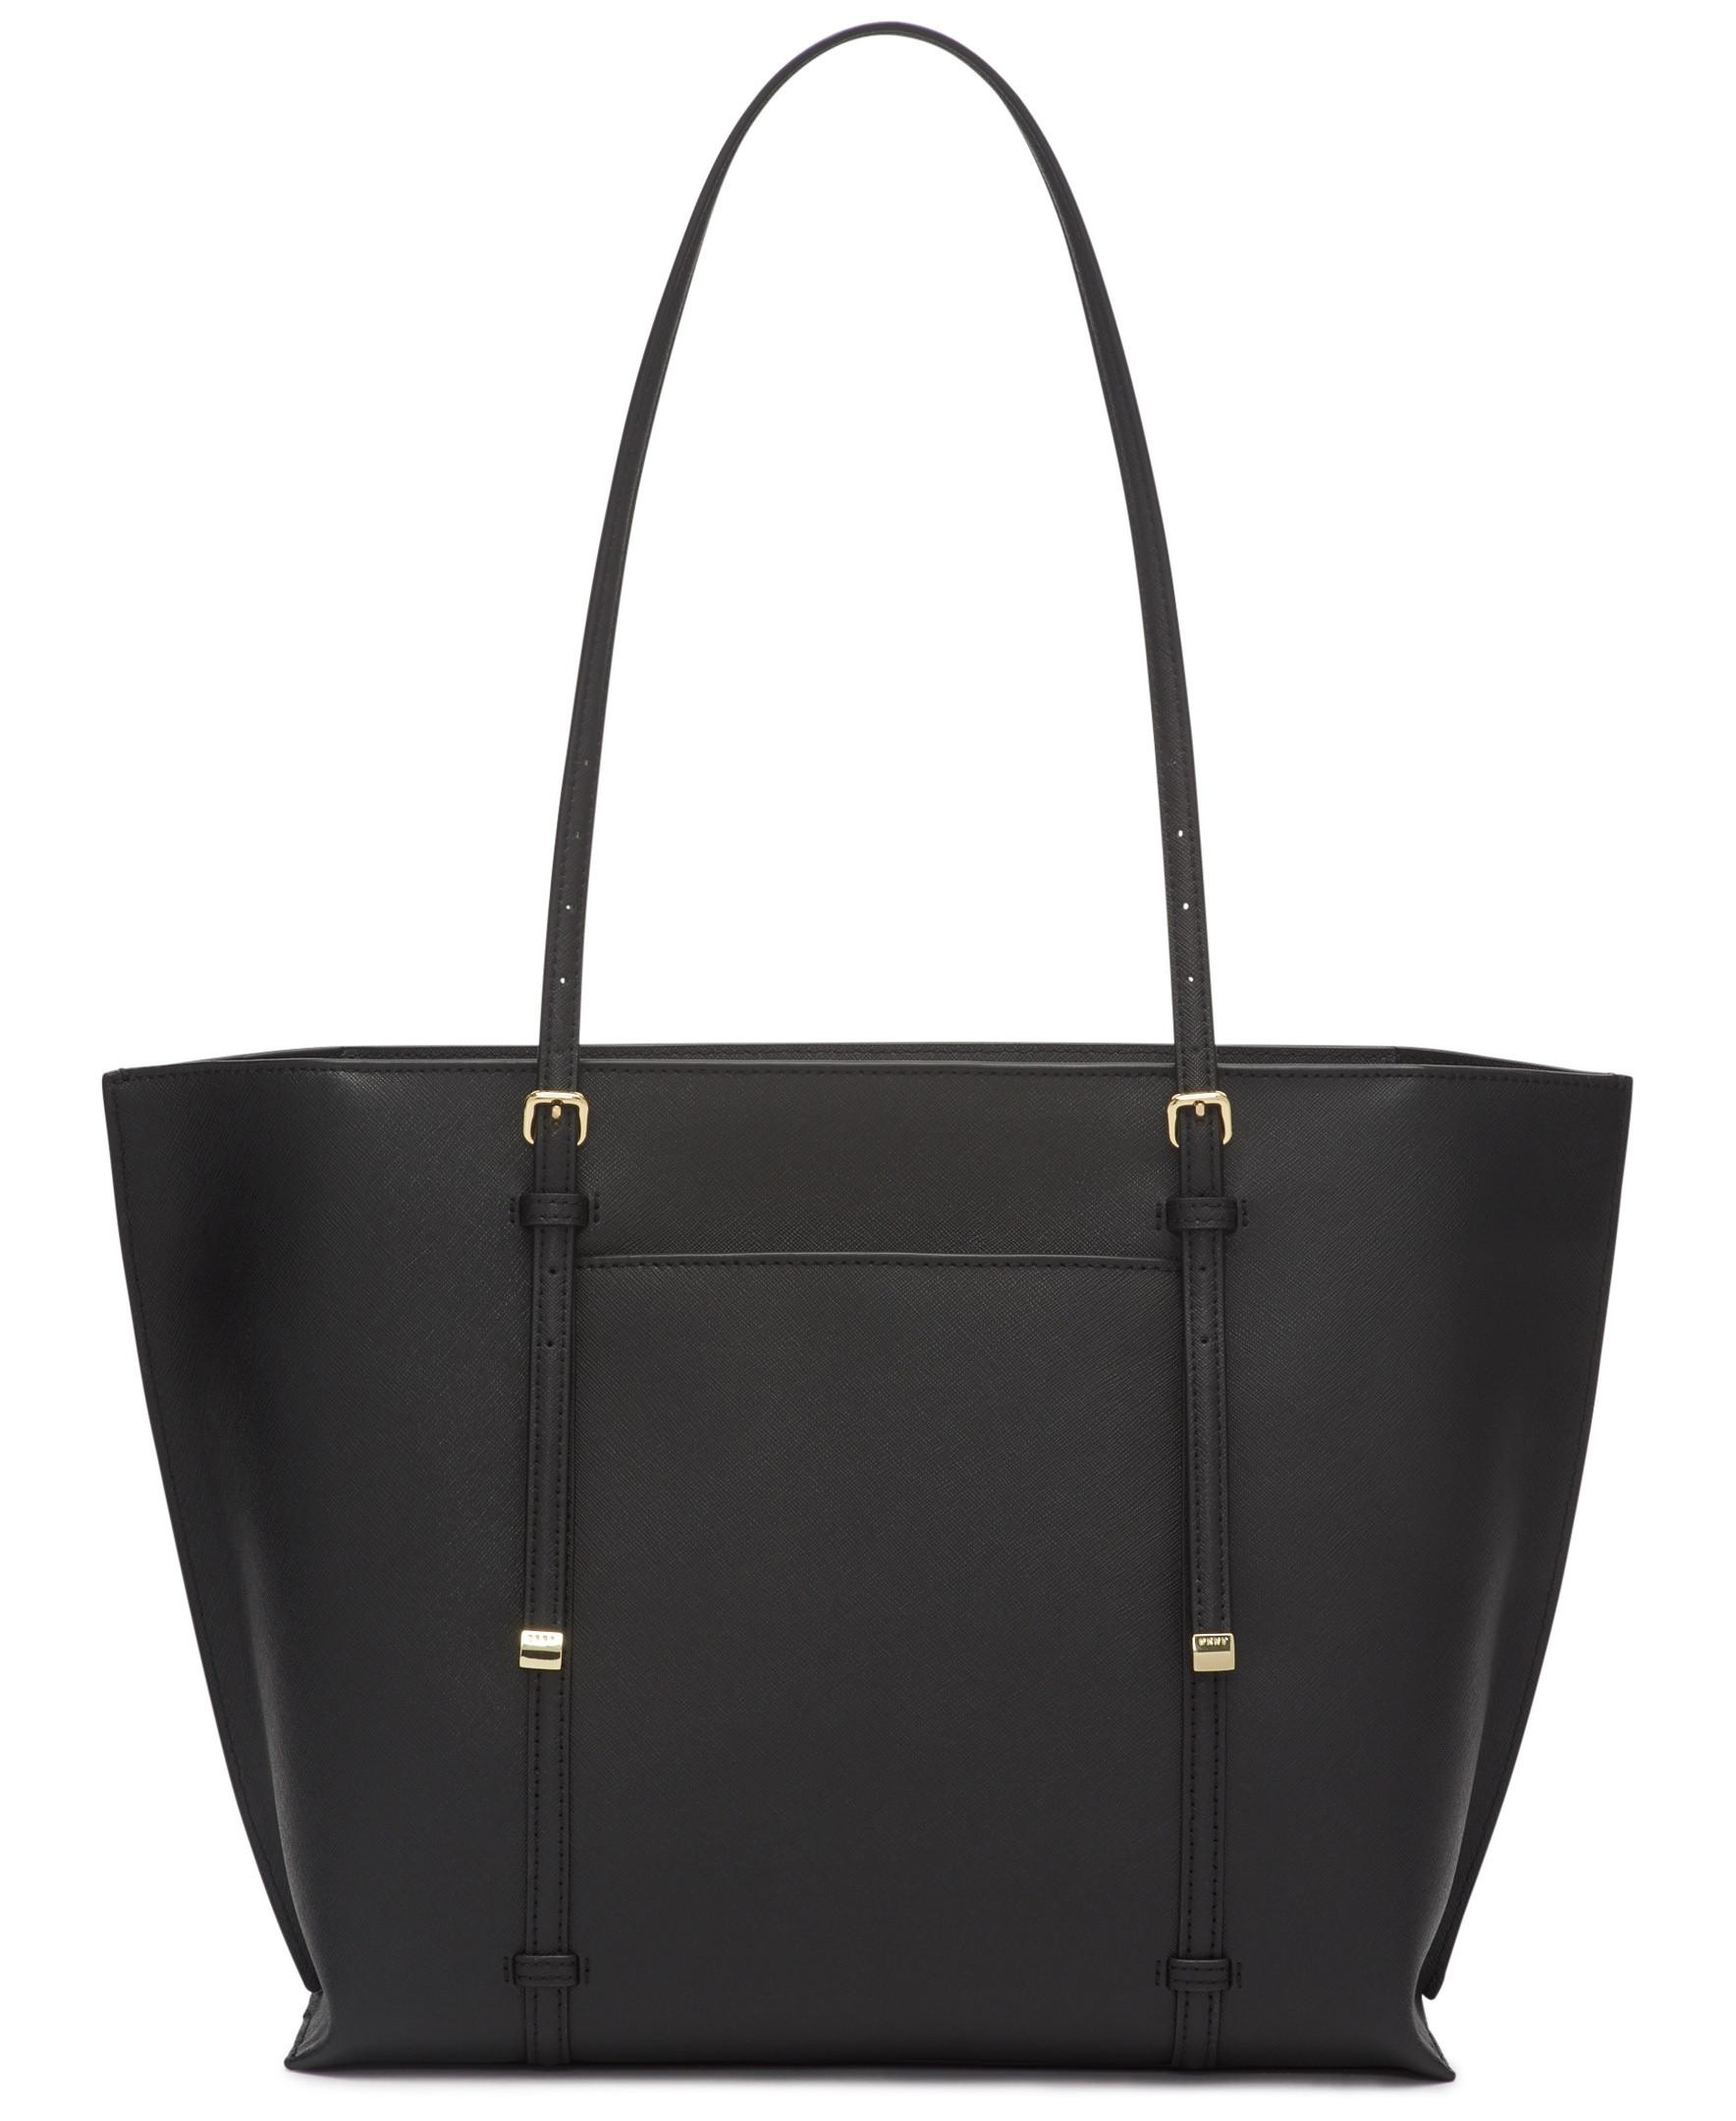 Tote bag, Nero/Oro, large image number 1